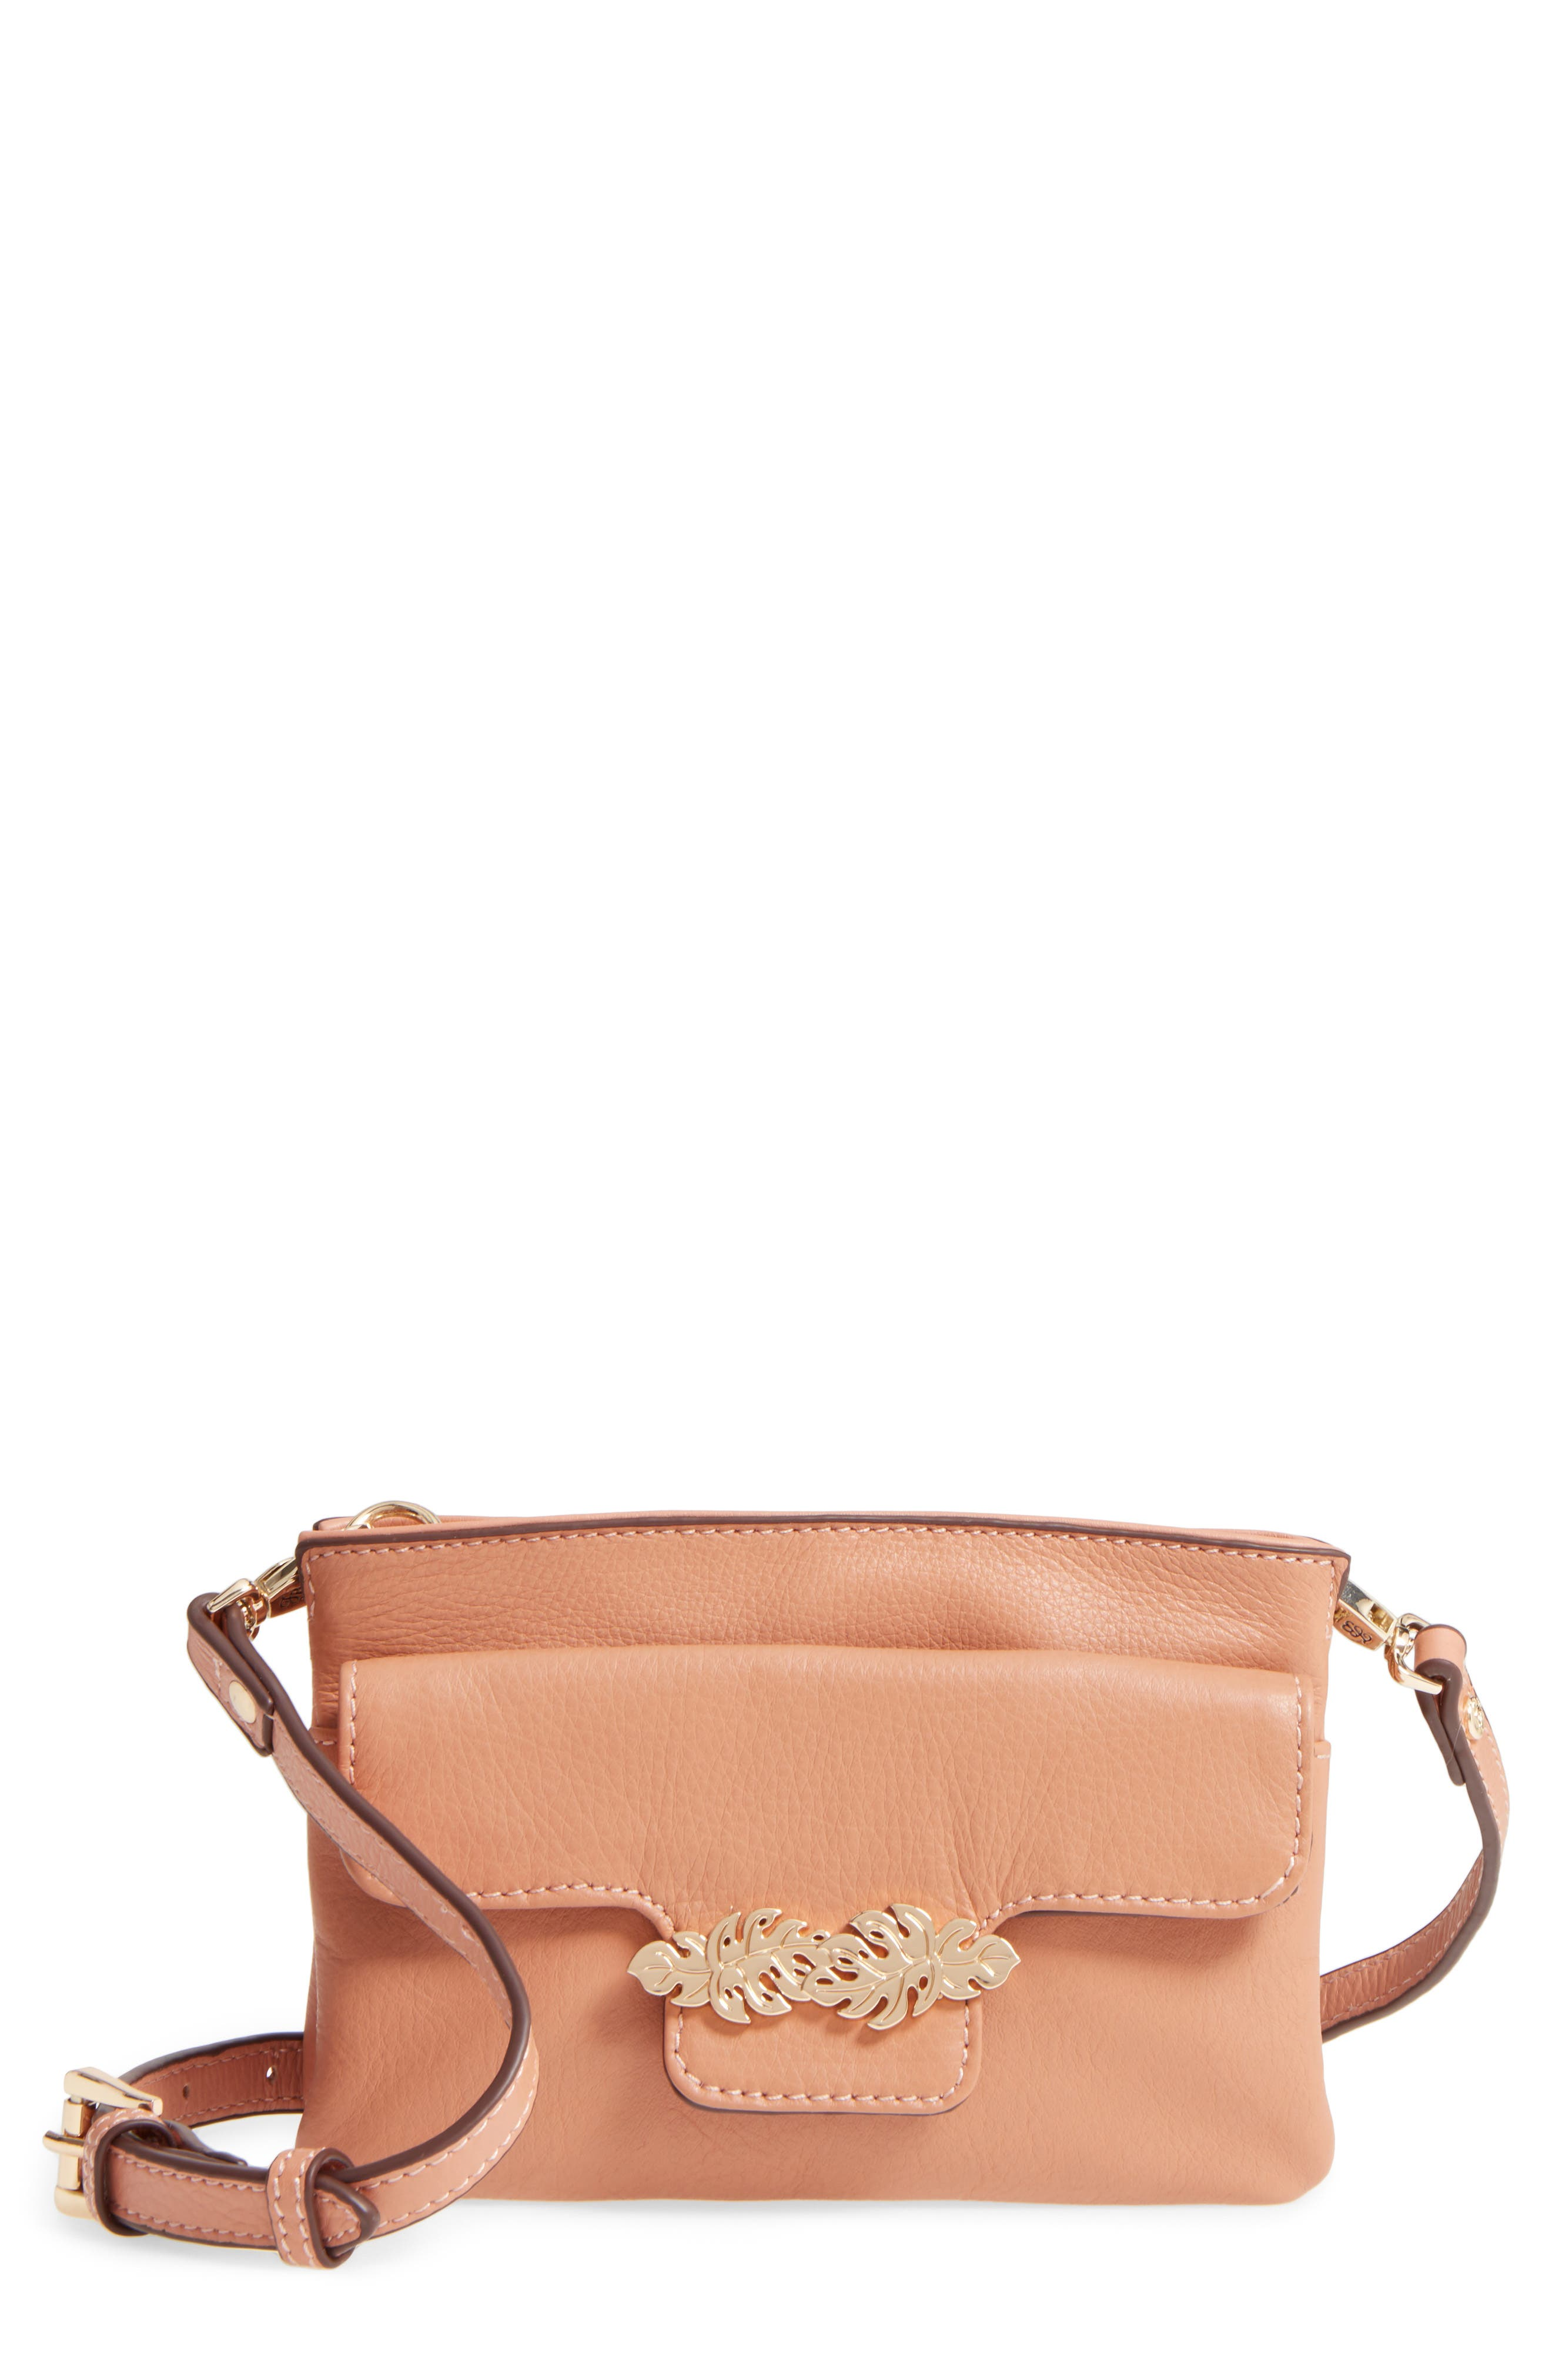 Katerini Leather Crossbody Wallet,                             Main thumbnail 1, color,                             650